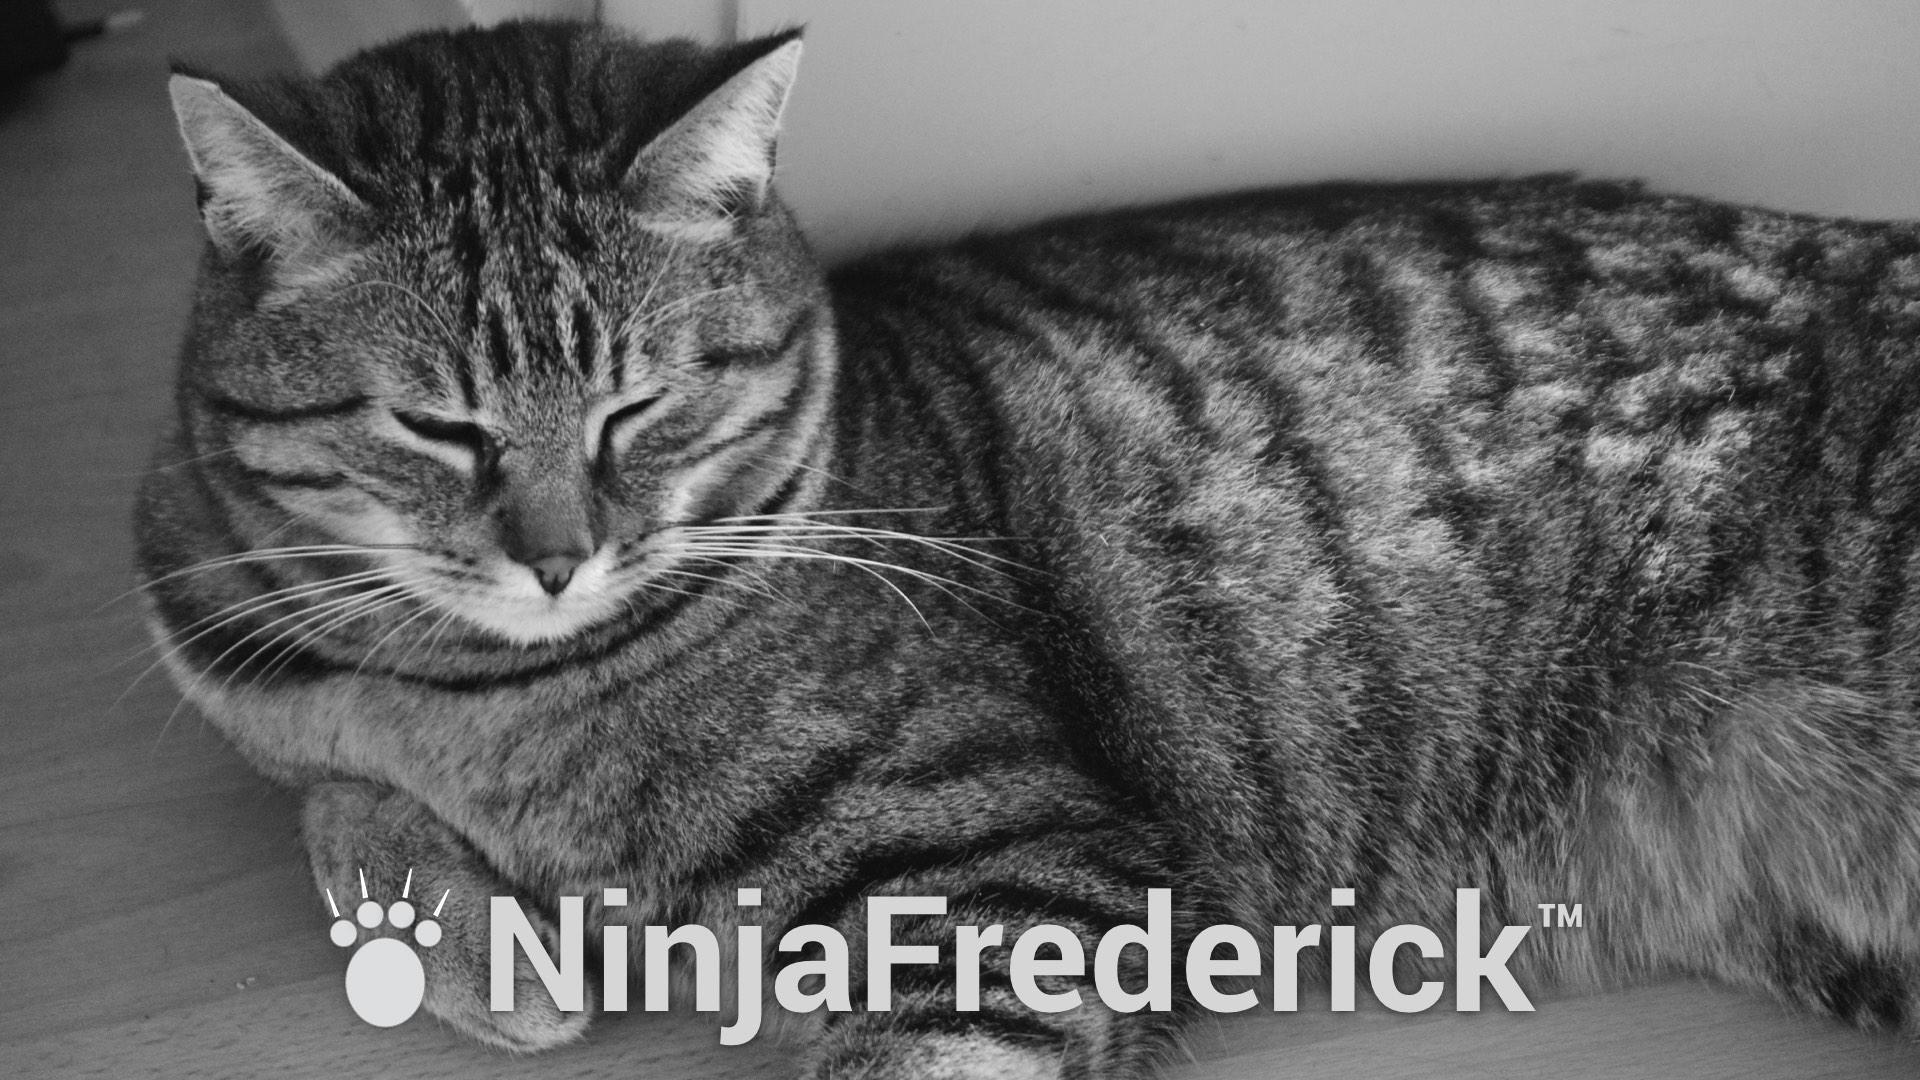 NinjaFrederick